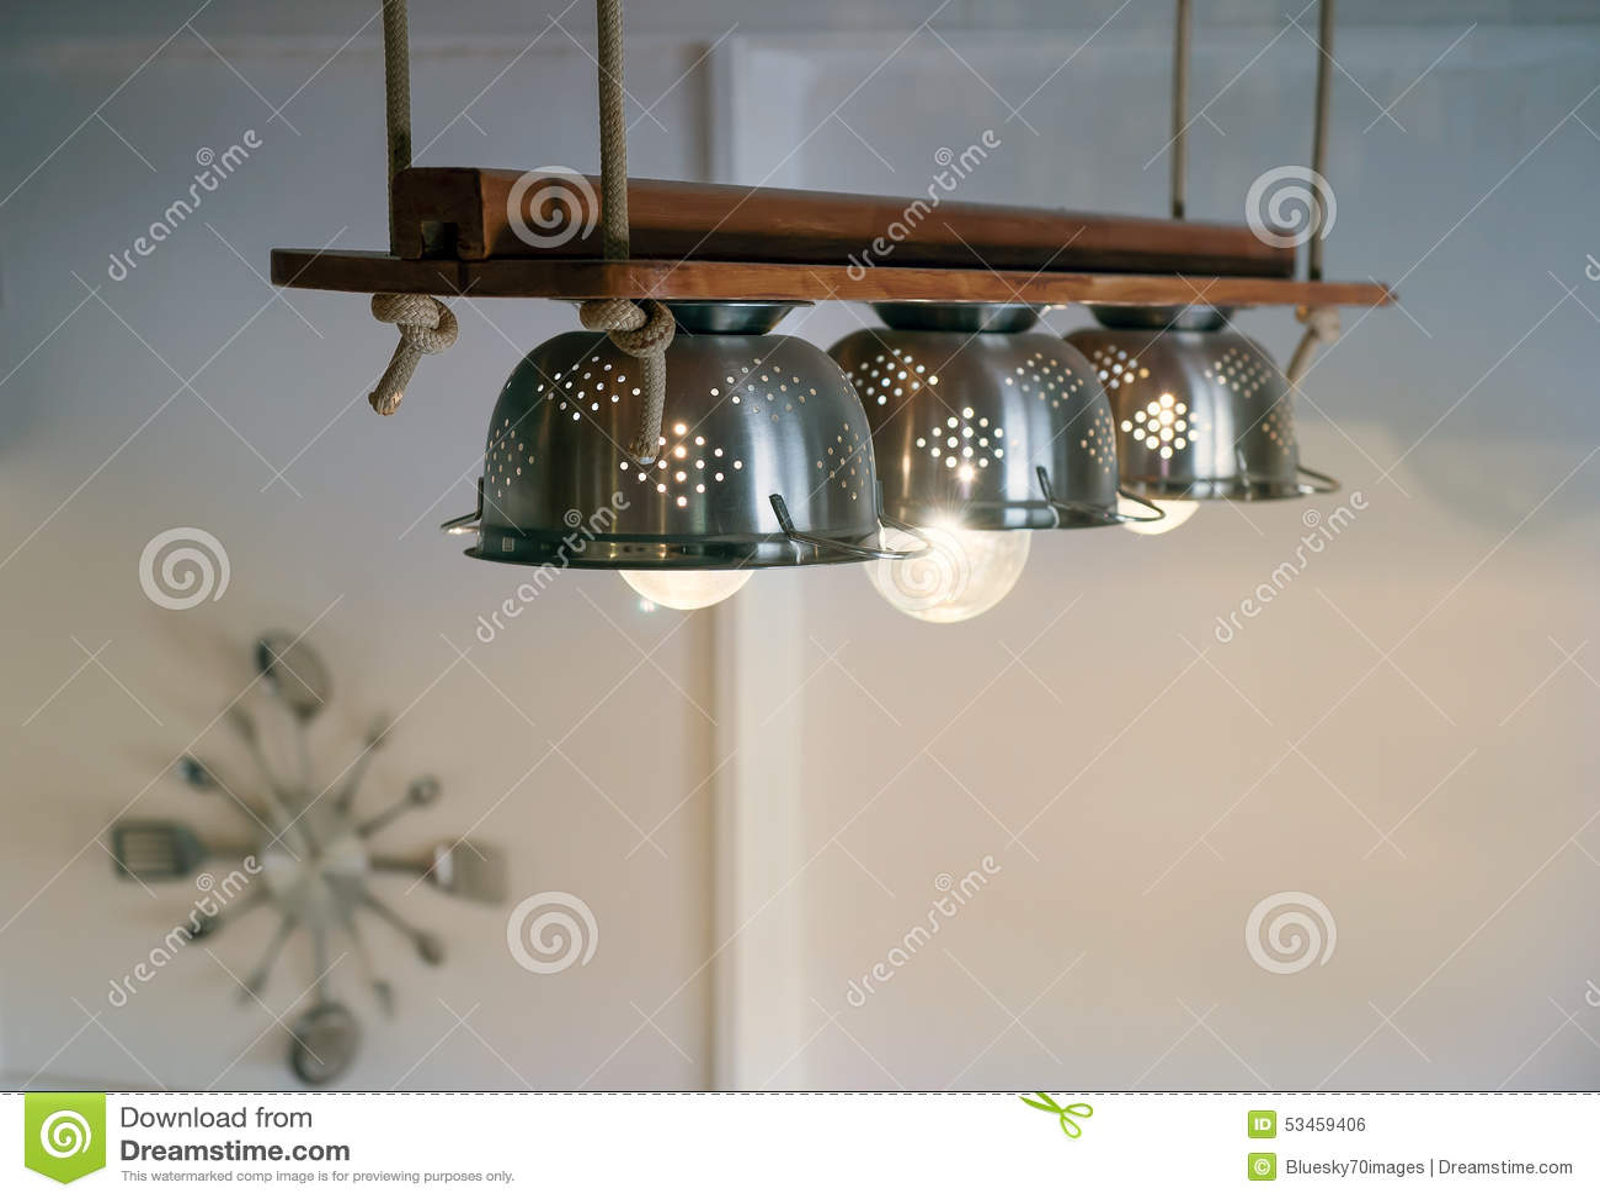 Hanged Diy Lamps Stock Photo Image 53459406